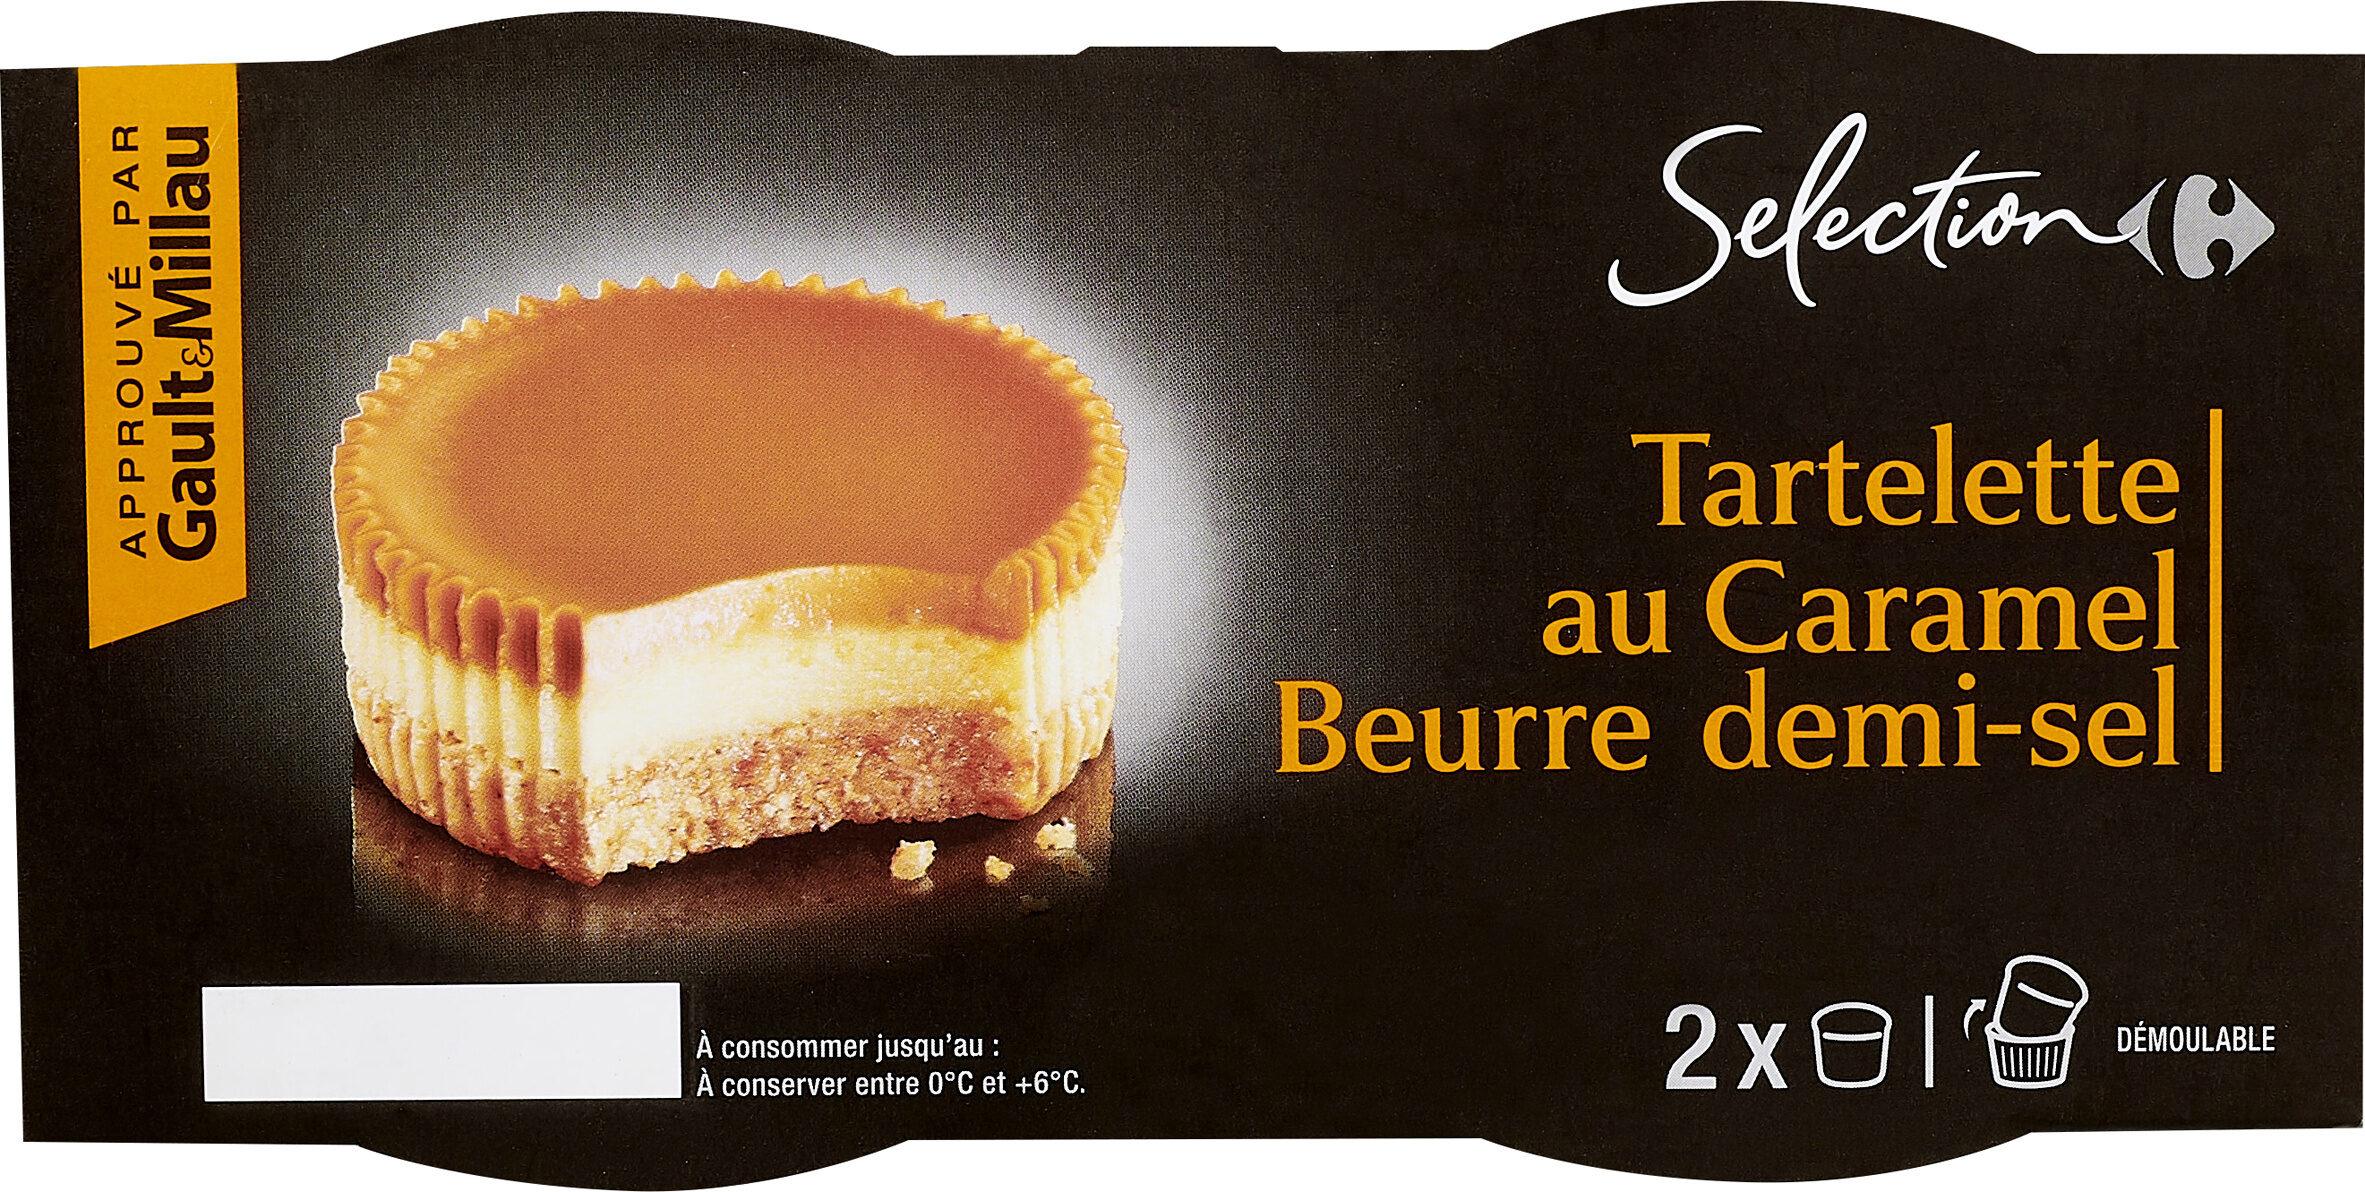 Tartelette au Caramel beurre salé - Product - fr